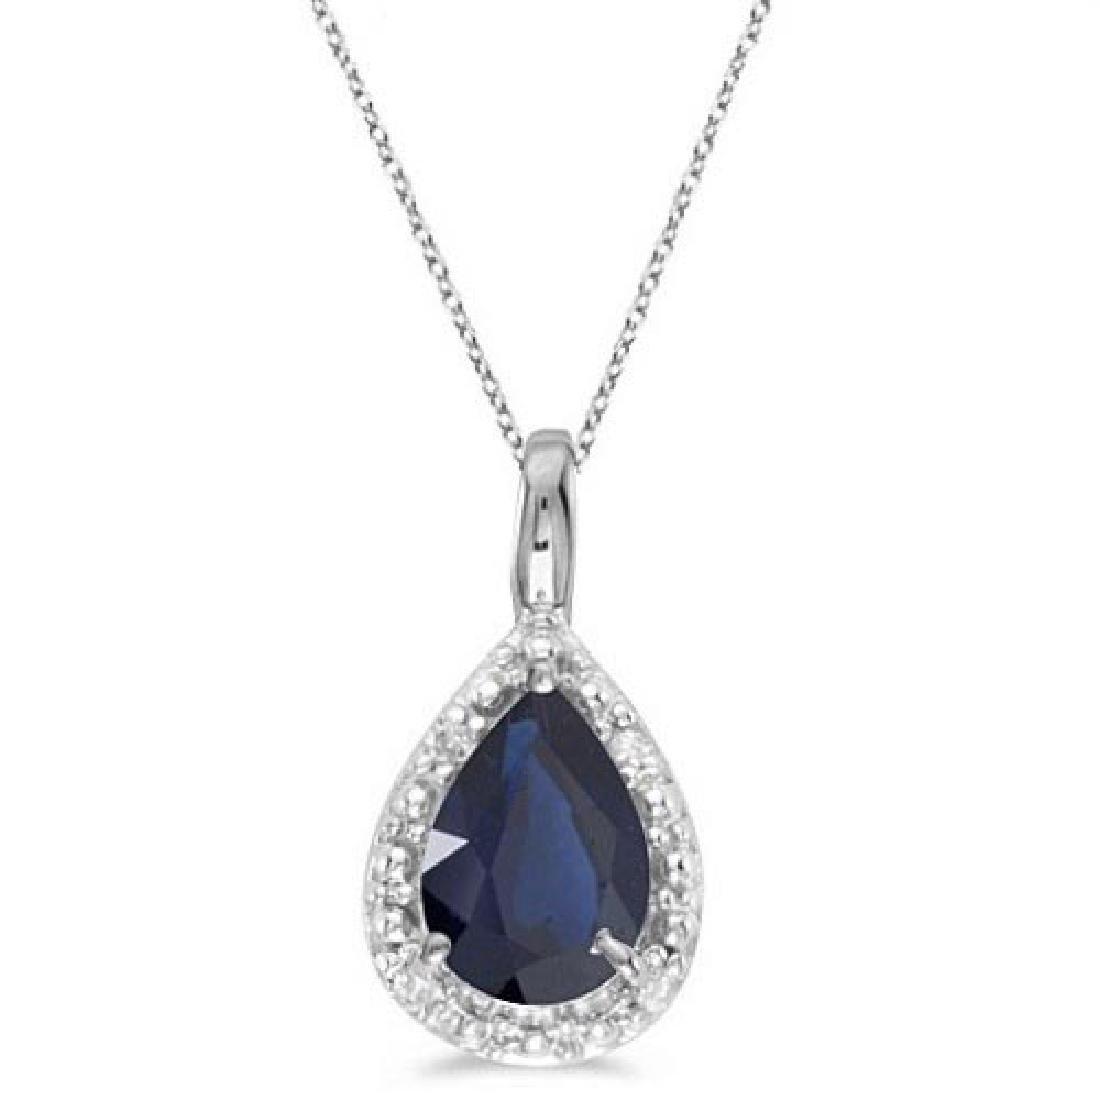 Pear Shaped Blue Sapphire Pendant Necklace 14k White Go